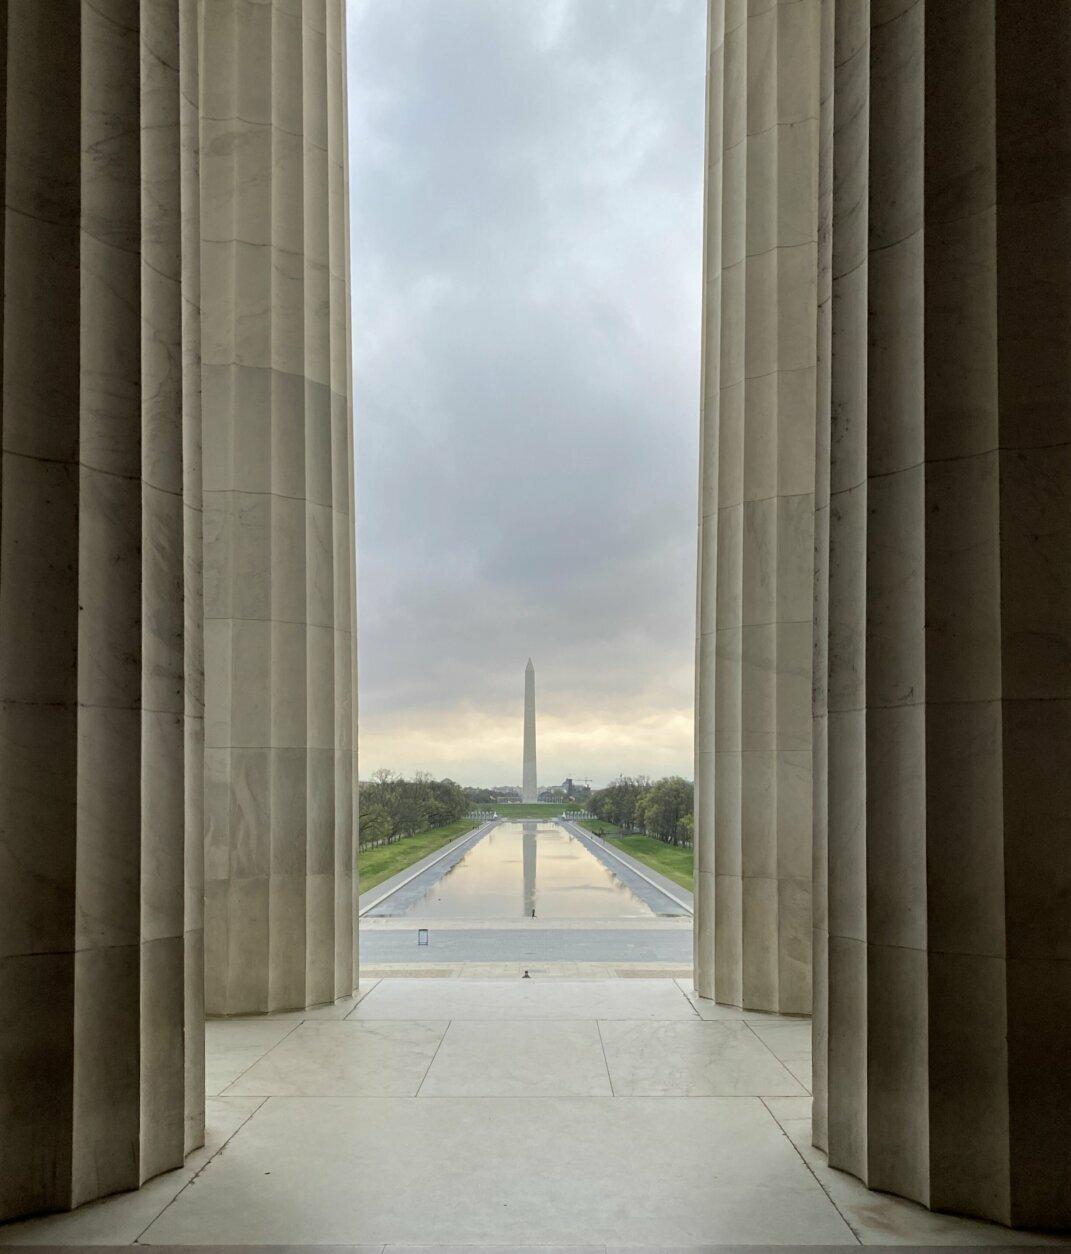 PHOTOS: 'Washington Alone' Documents DC Sites During The